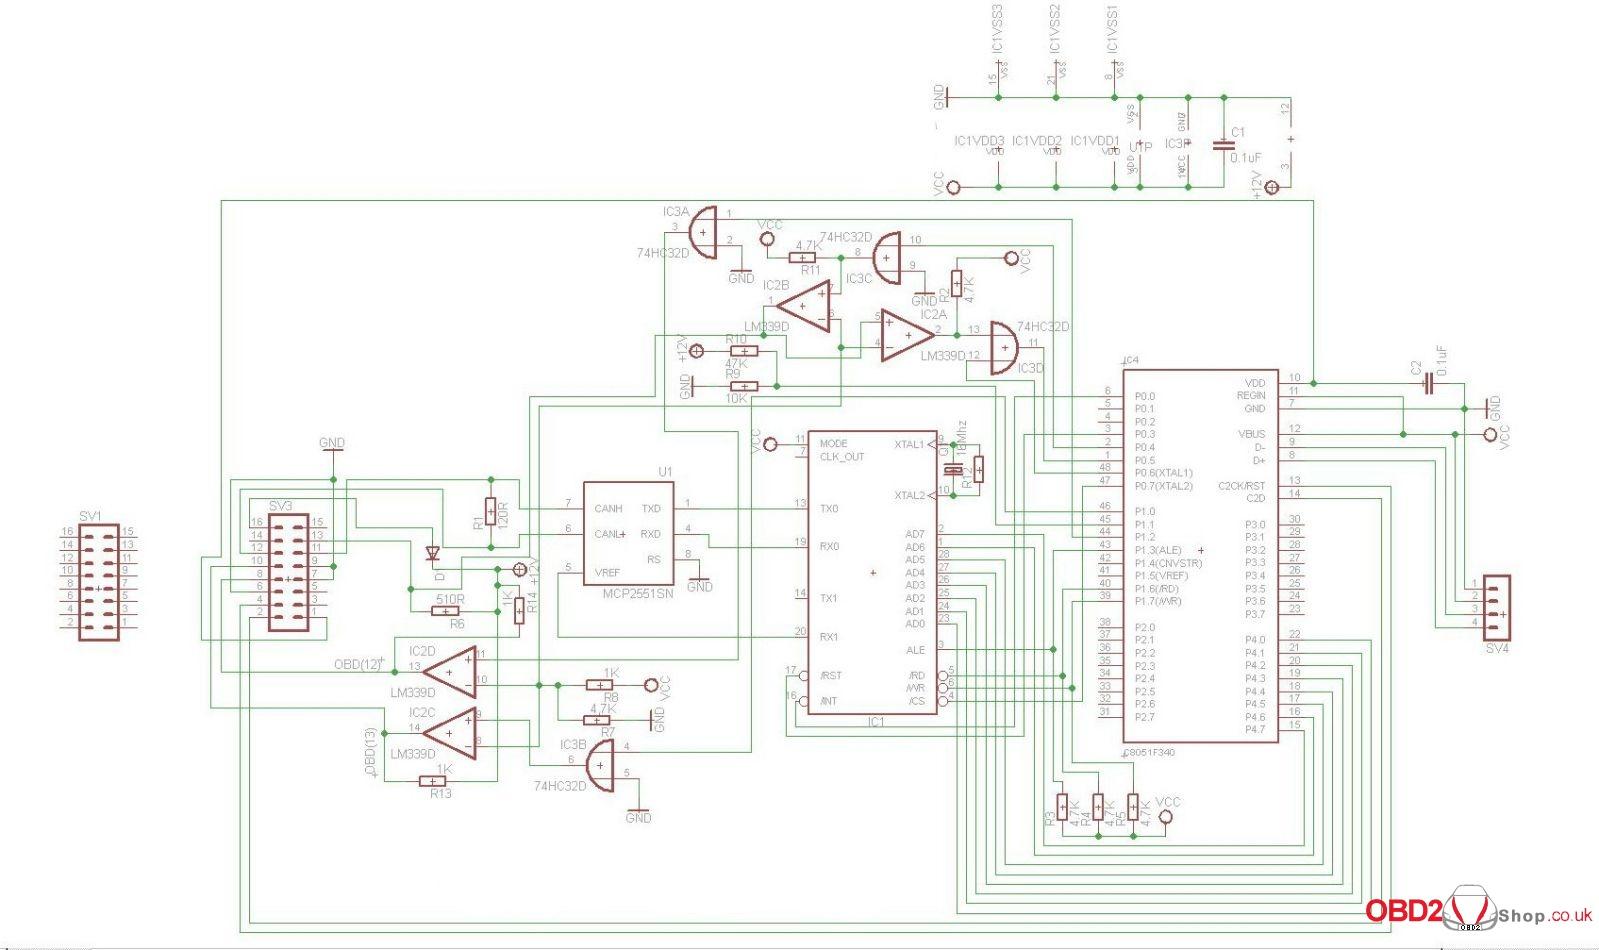 mpps-v18-pcb-wiring-diagram